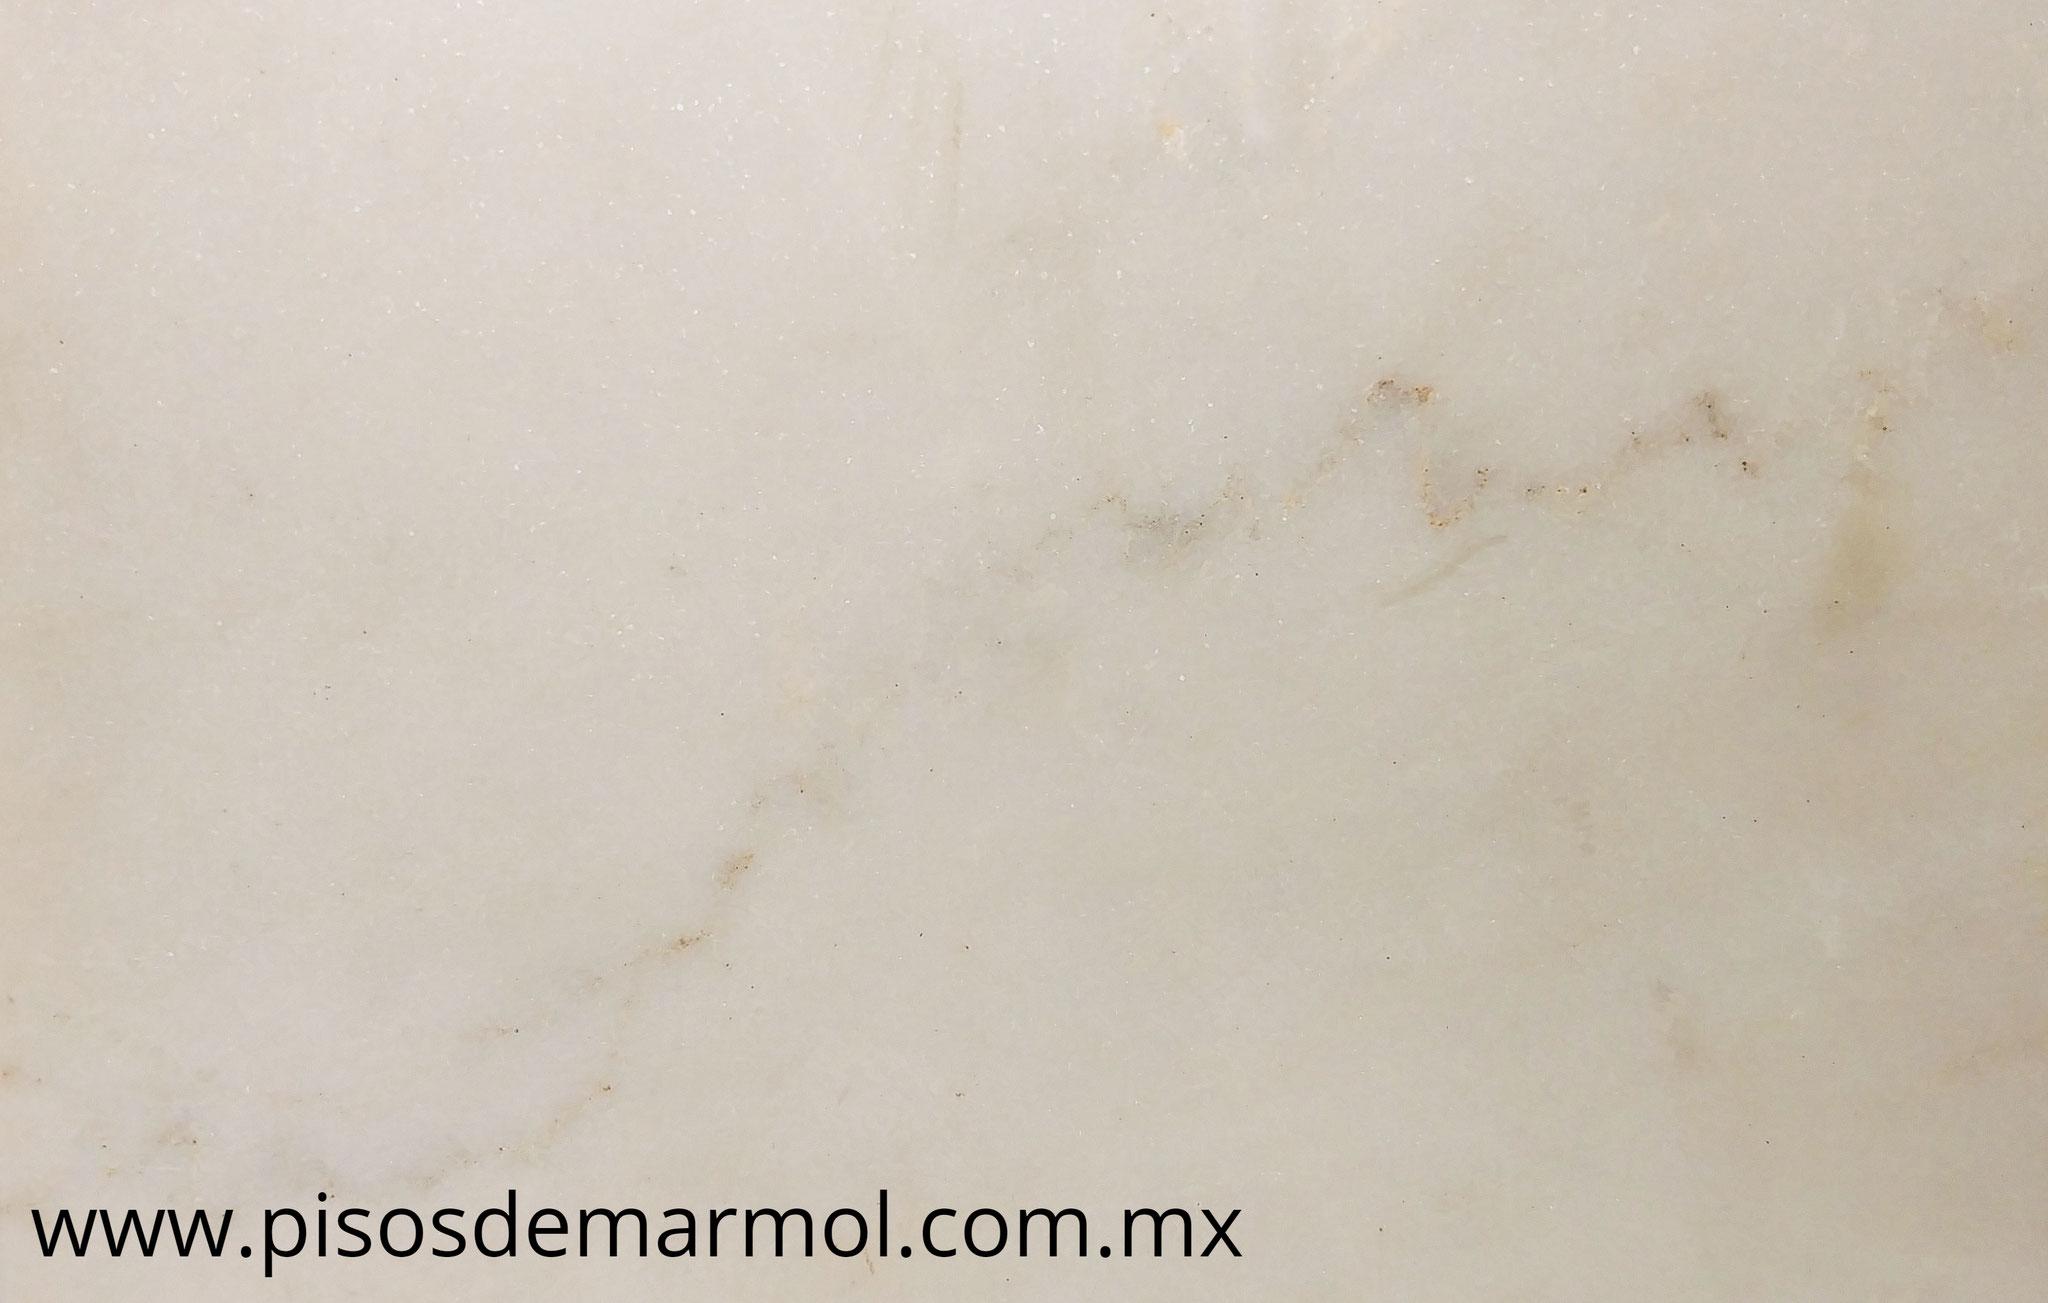 white marble, white carrara marble, carrara white, white calacatta marble, calacatta white marble, white royal marble, white carrara marble slab, carrara marble countertop, white carrara marble tile, marmol blanco, marmol blanco carrara